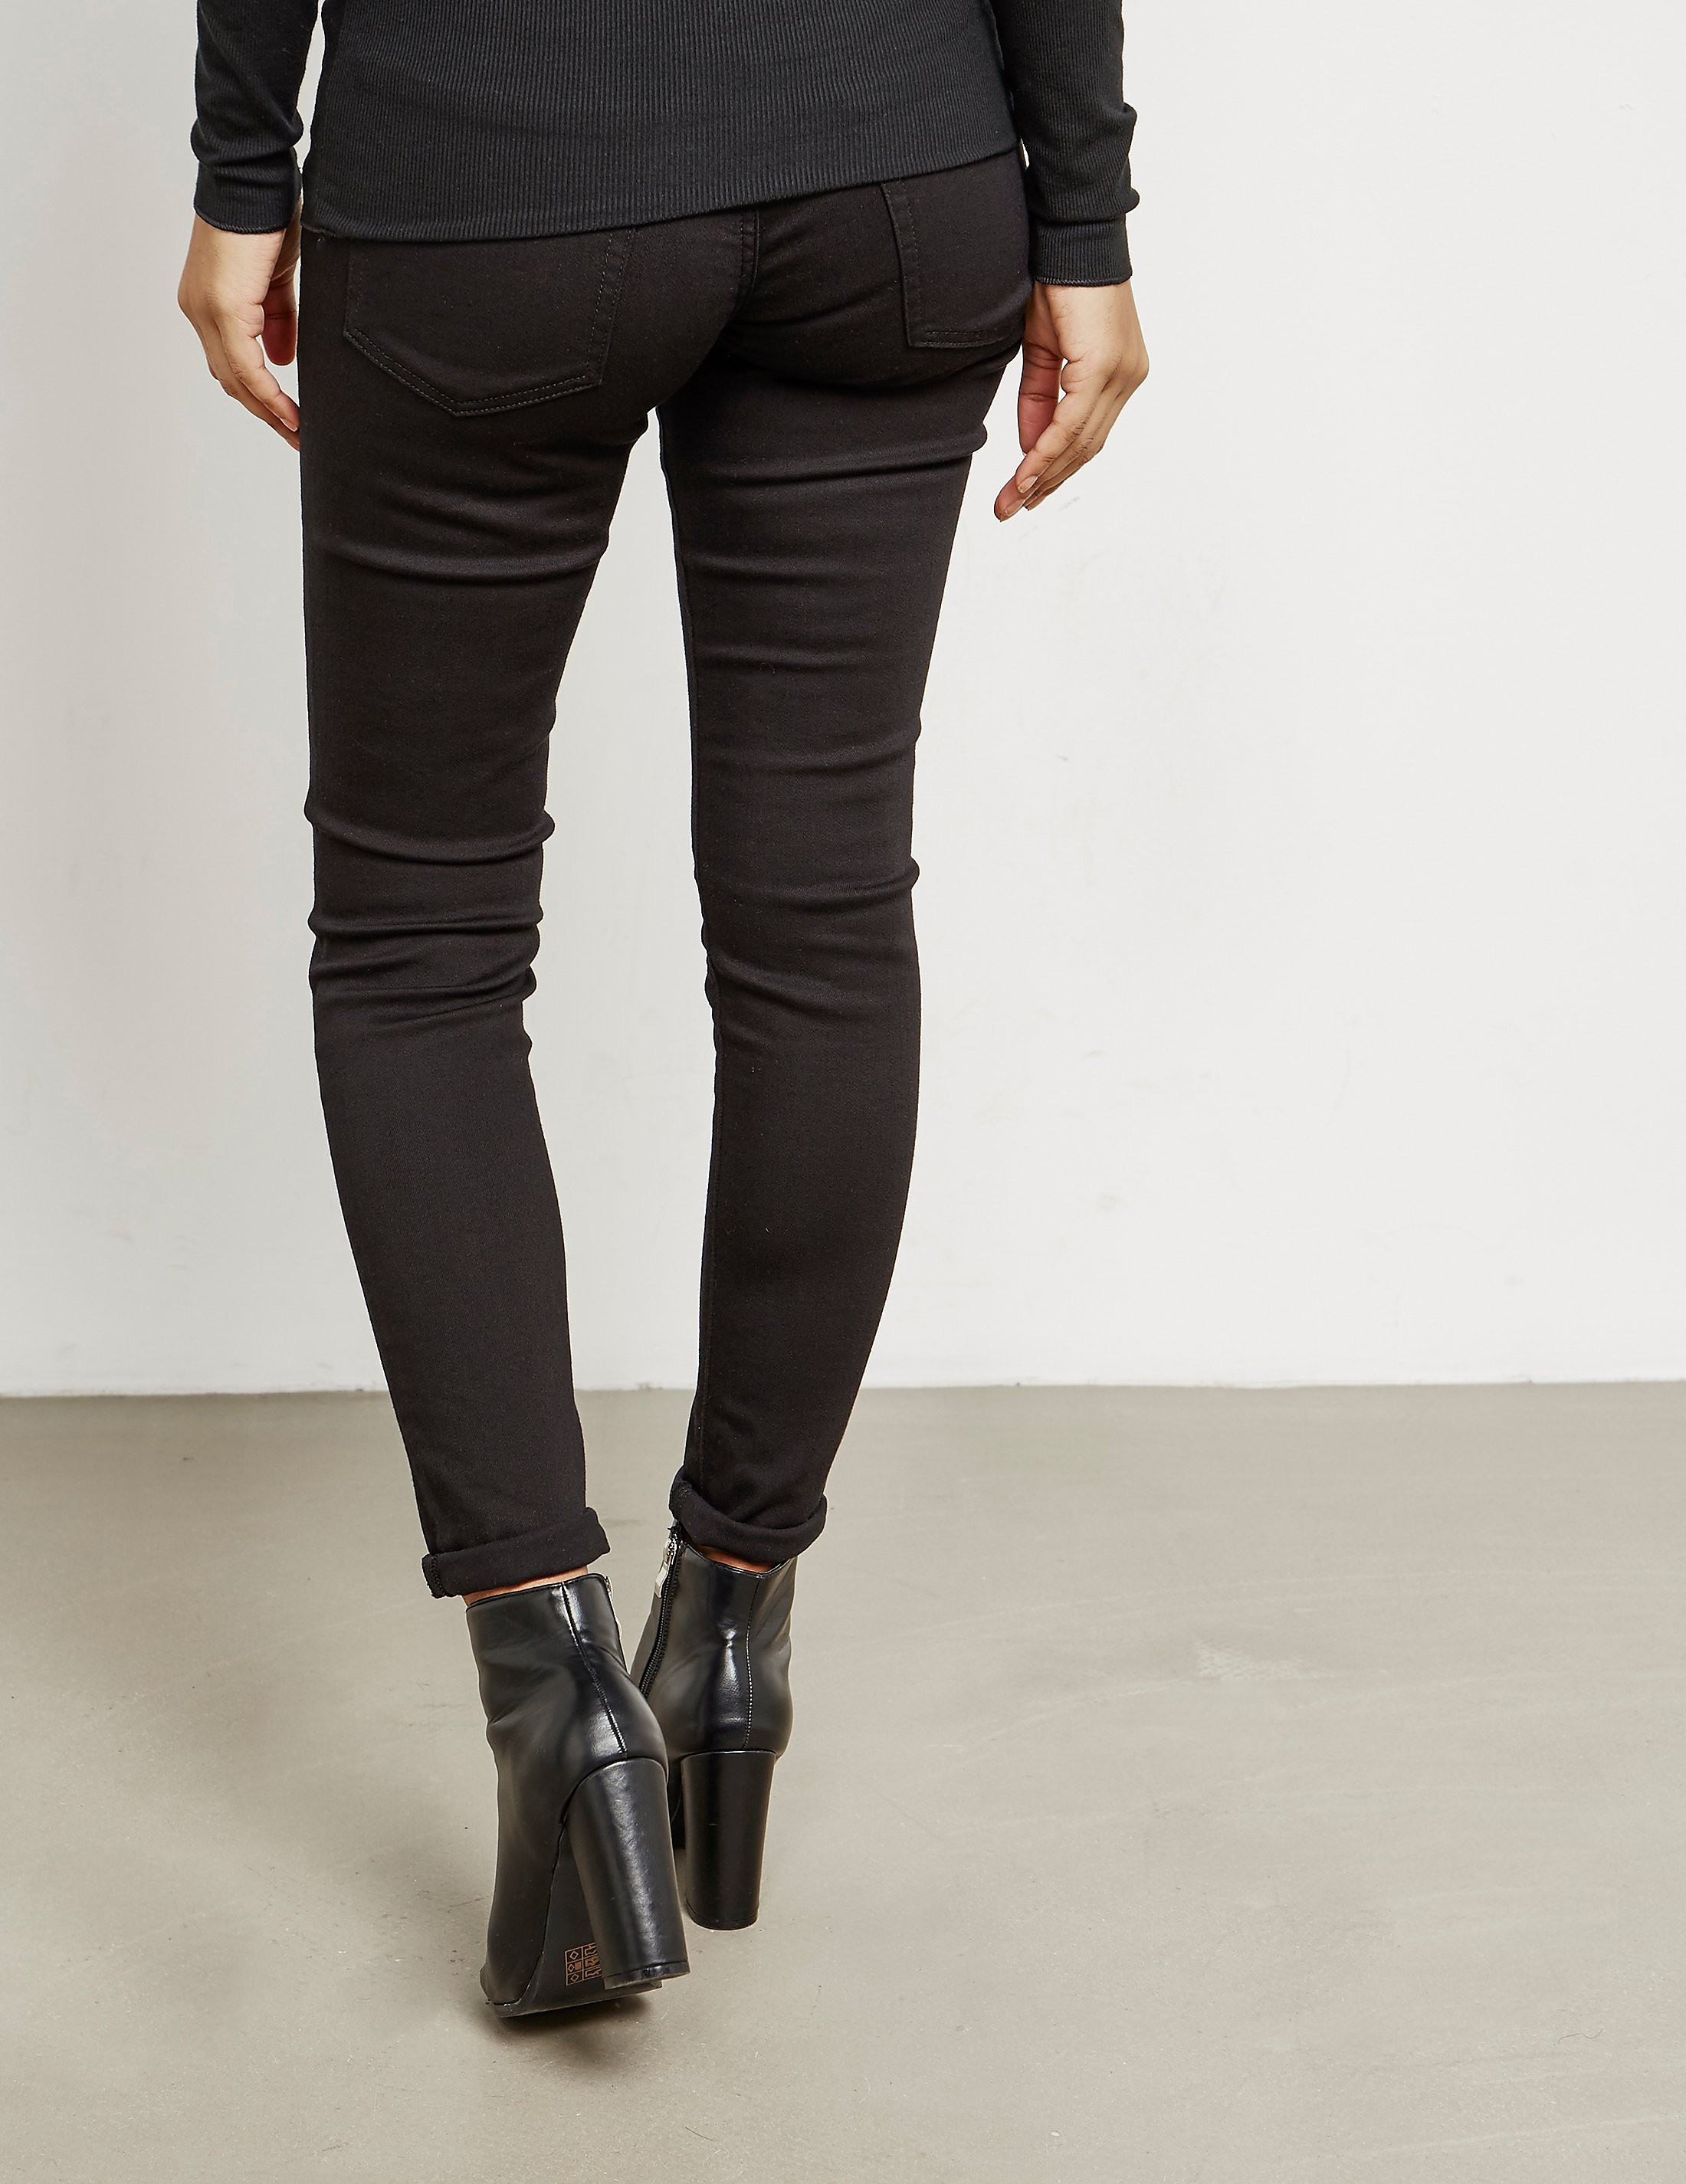 Polo Ralph Lauren Super Skinny Jeans